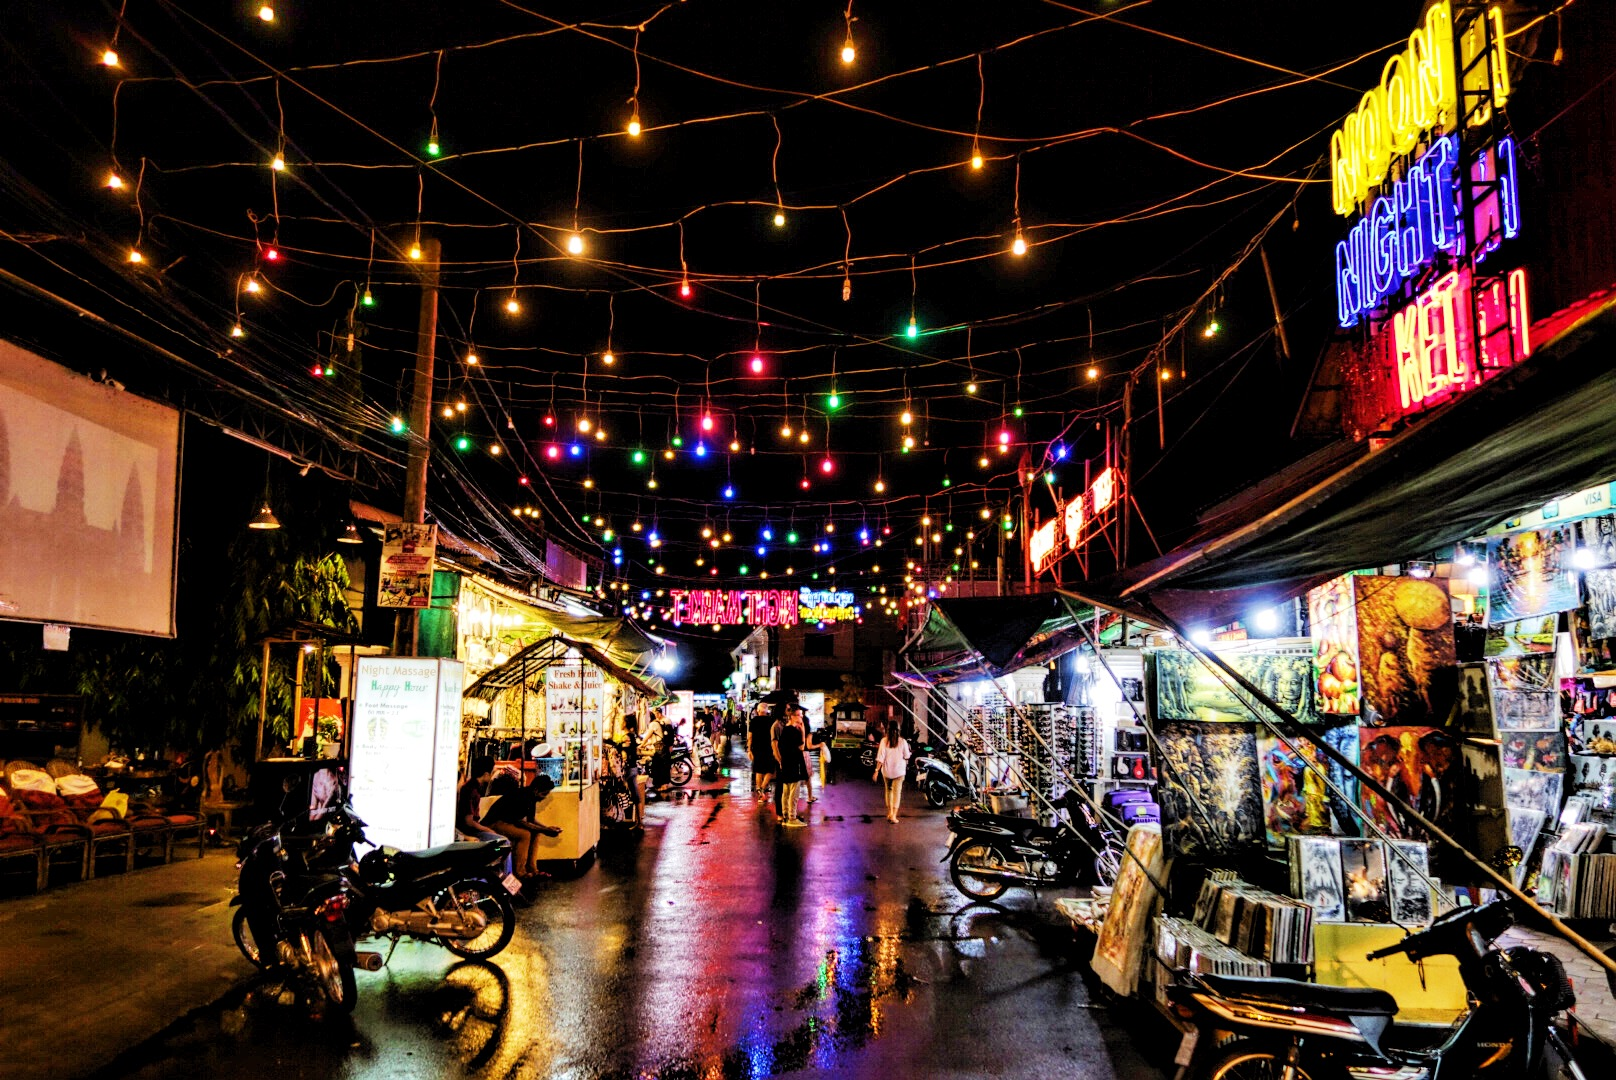 The Angkor Night Market